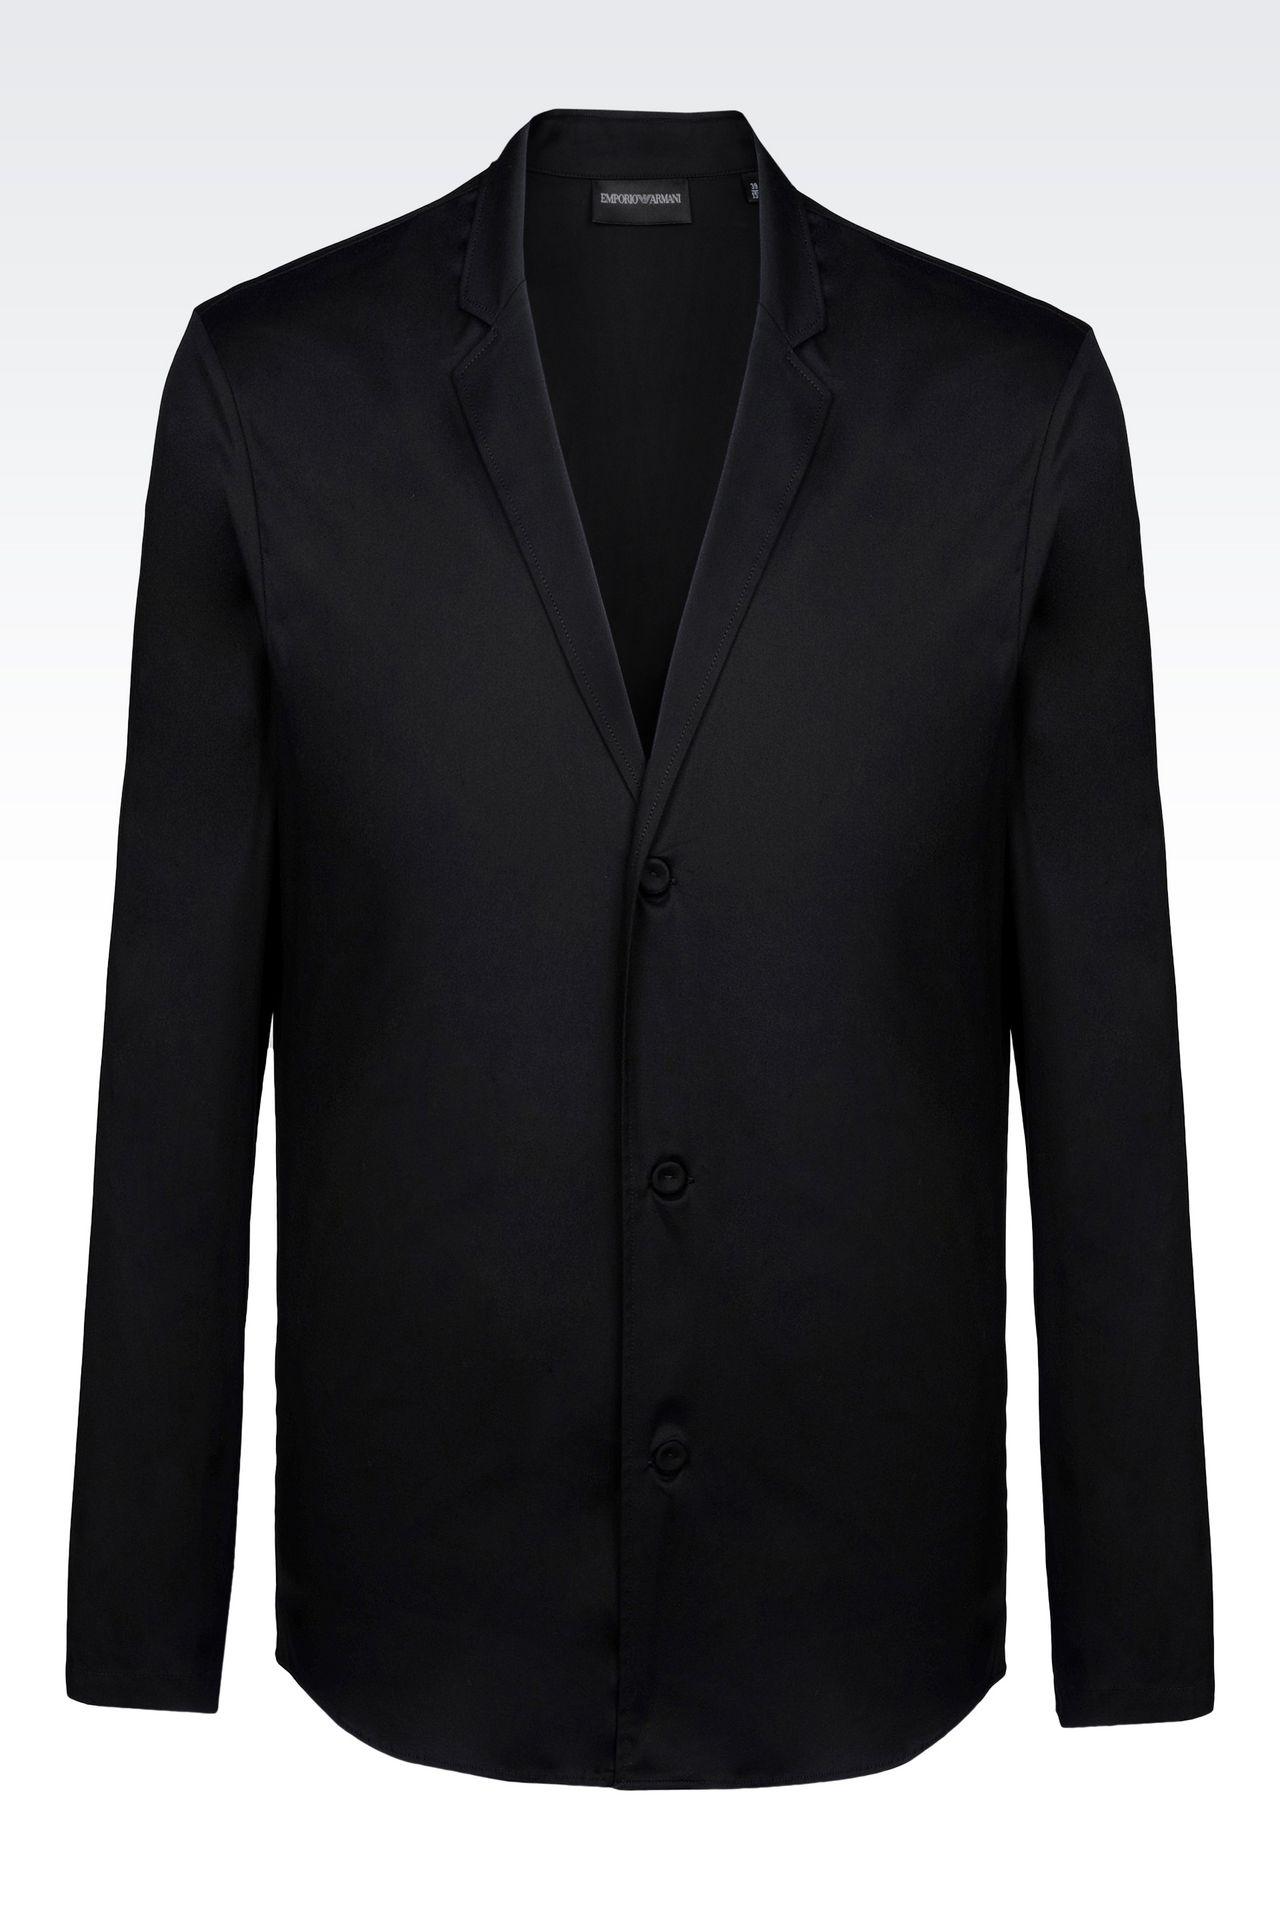 Рубашка мужская Armani 38425711iv EA рубашка мужская armani 85959595 exchangeiridescent